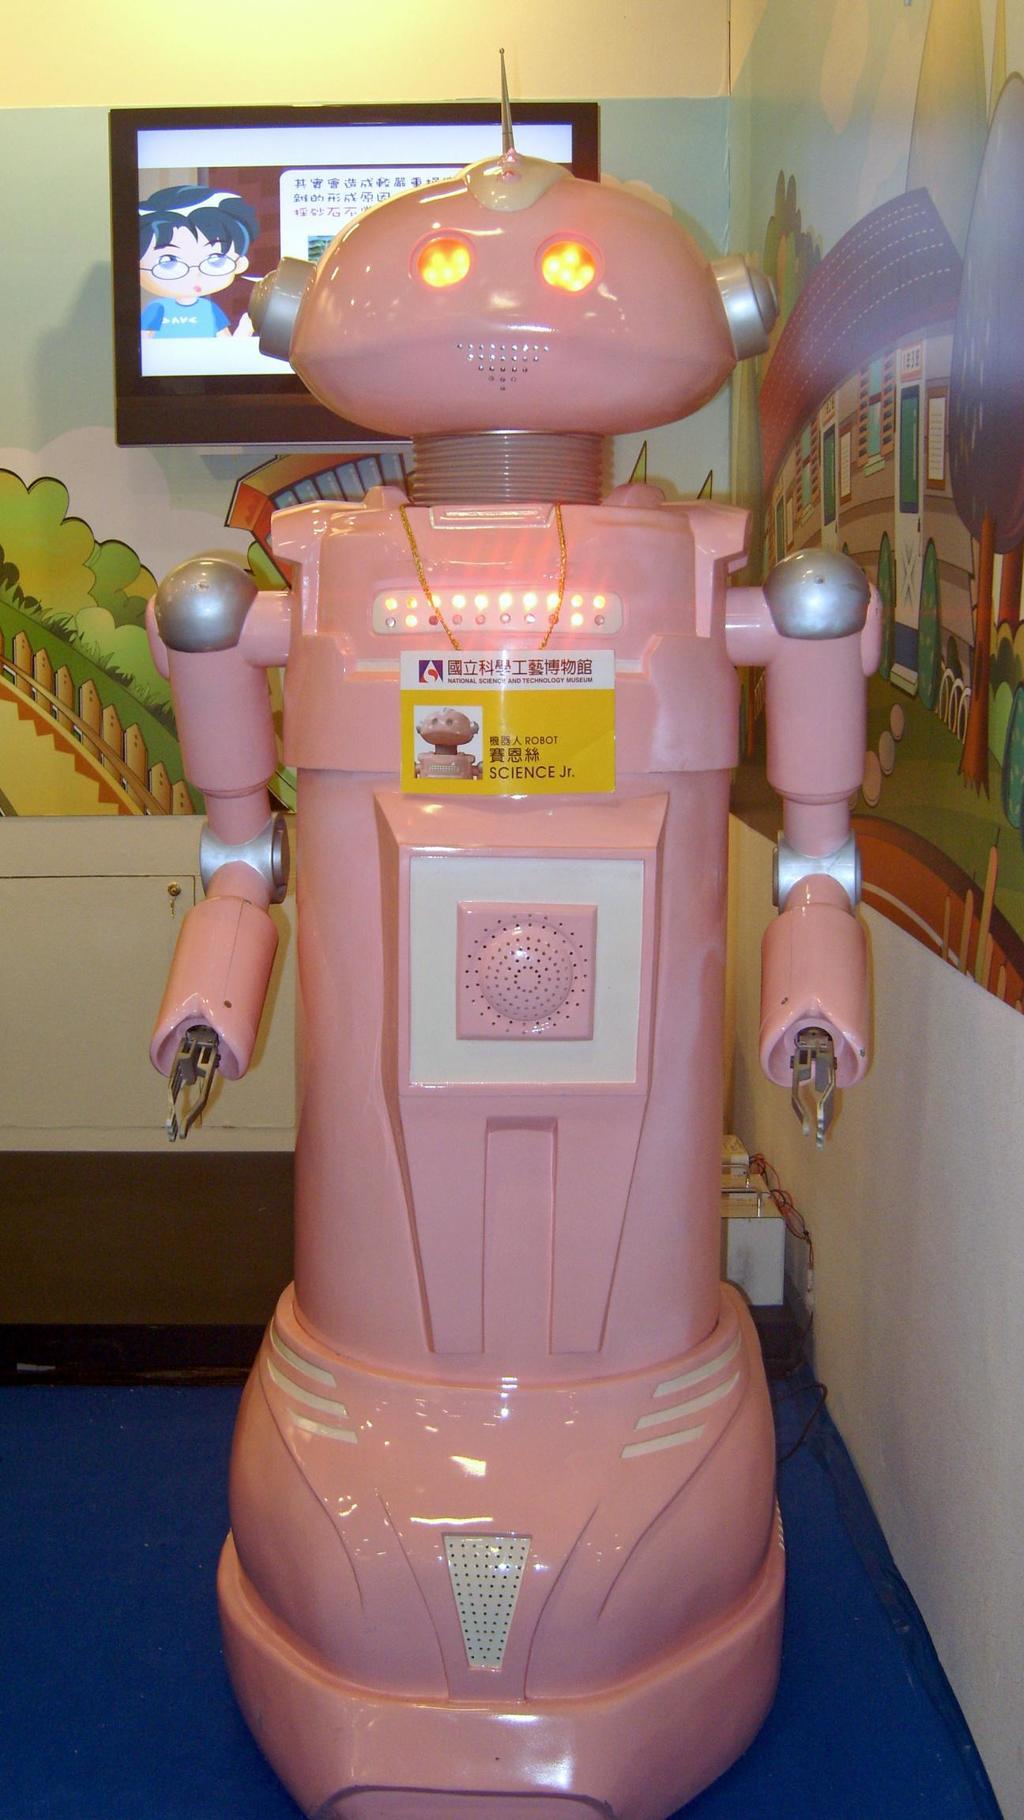 2008 Taipei IT Month Day9 NTSM Robot Science Junior